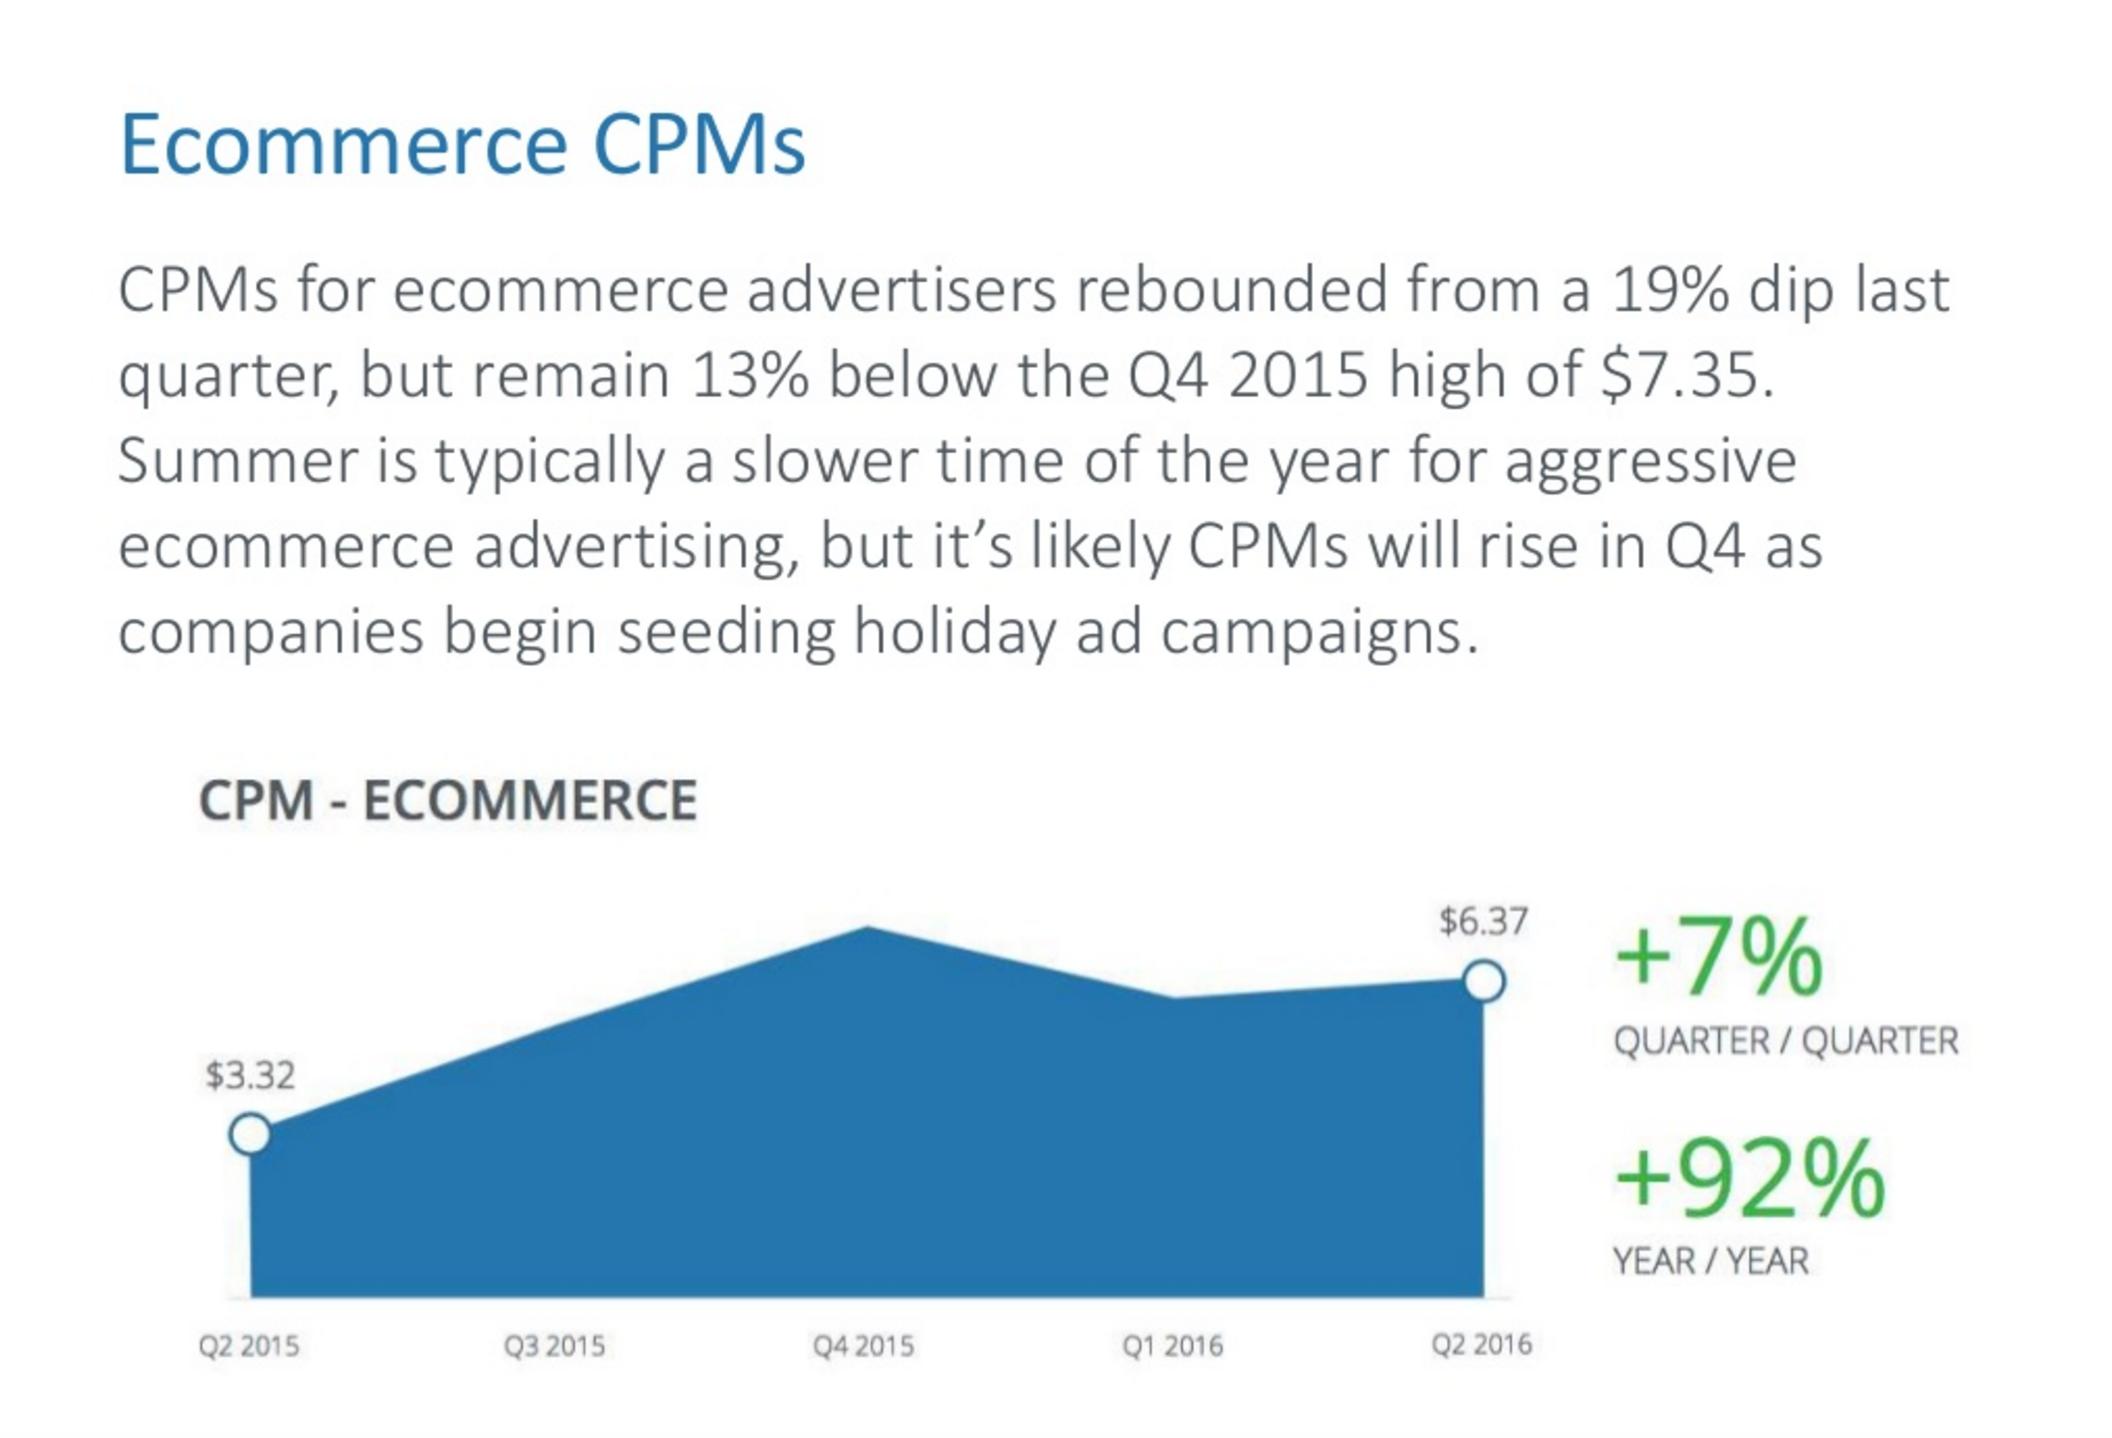 ecommerce-cpms